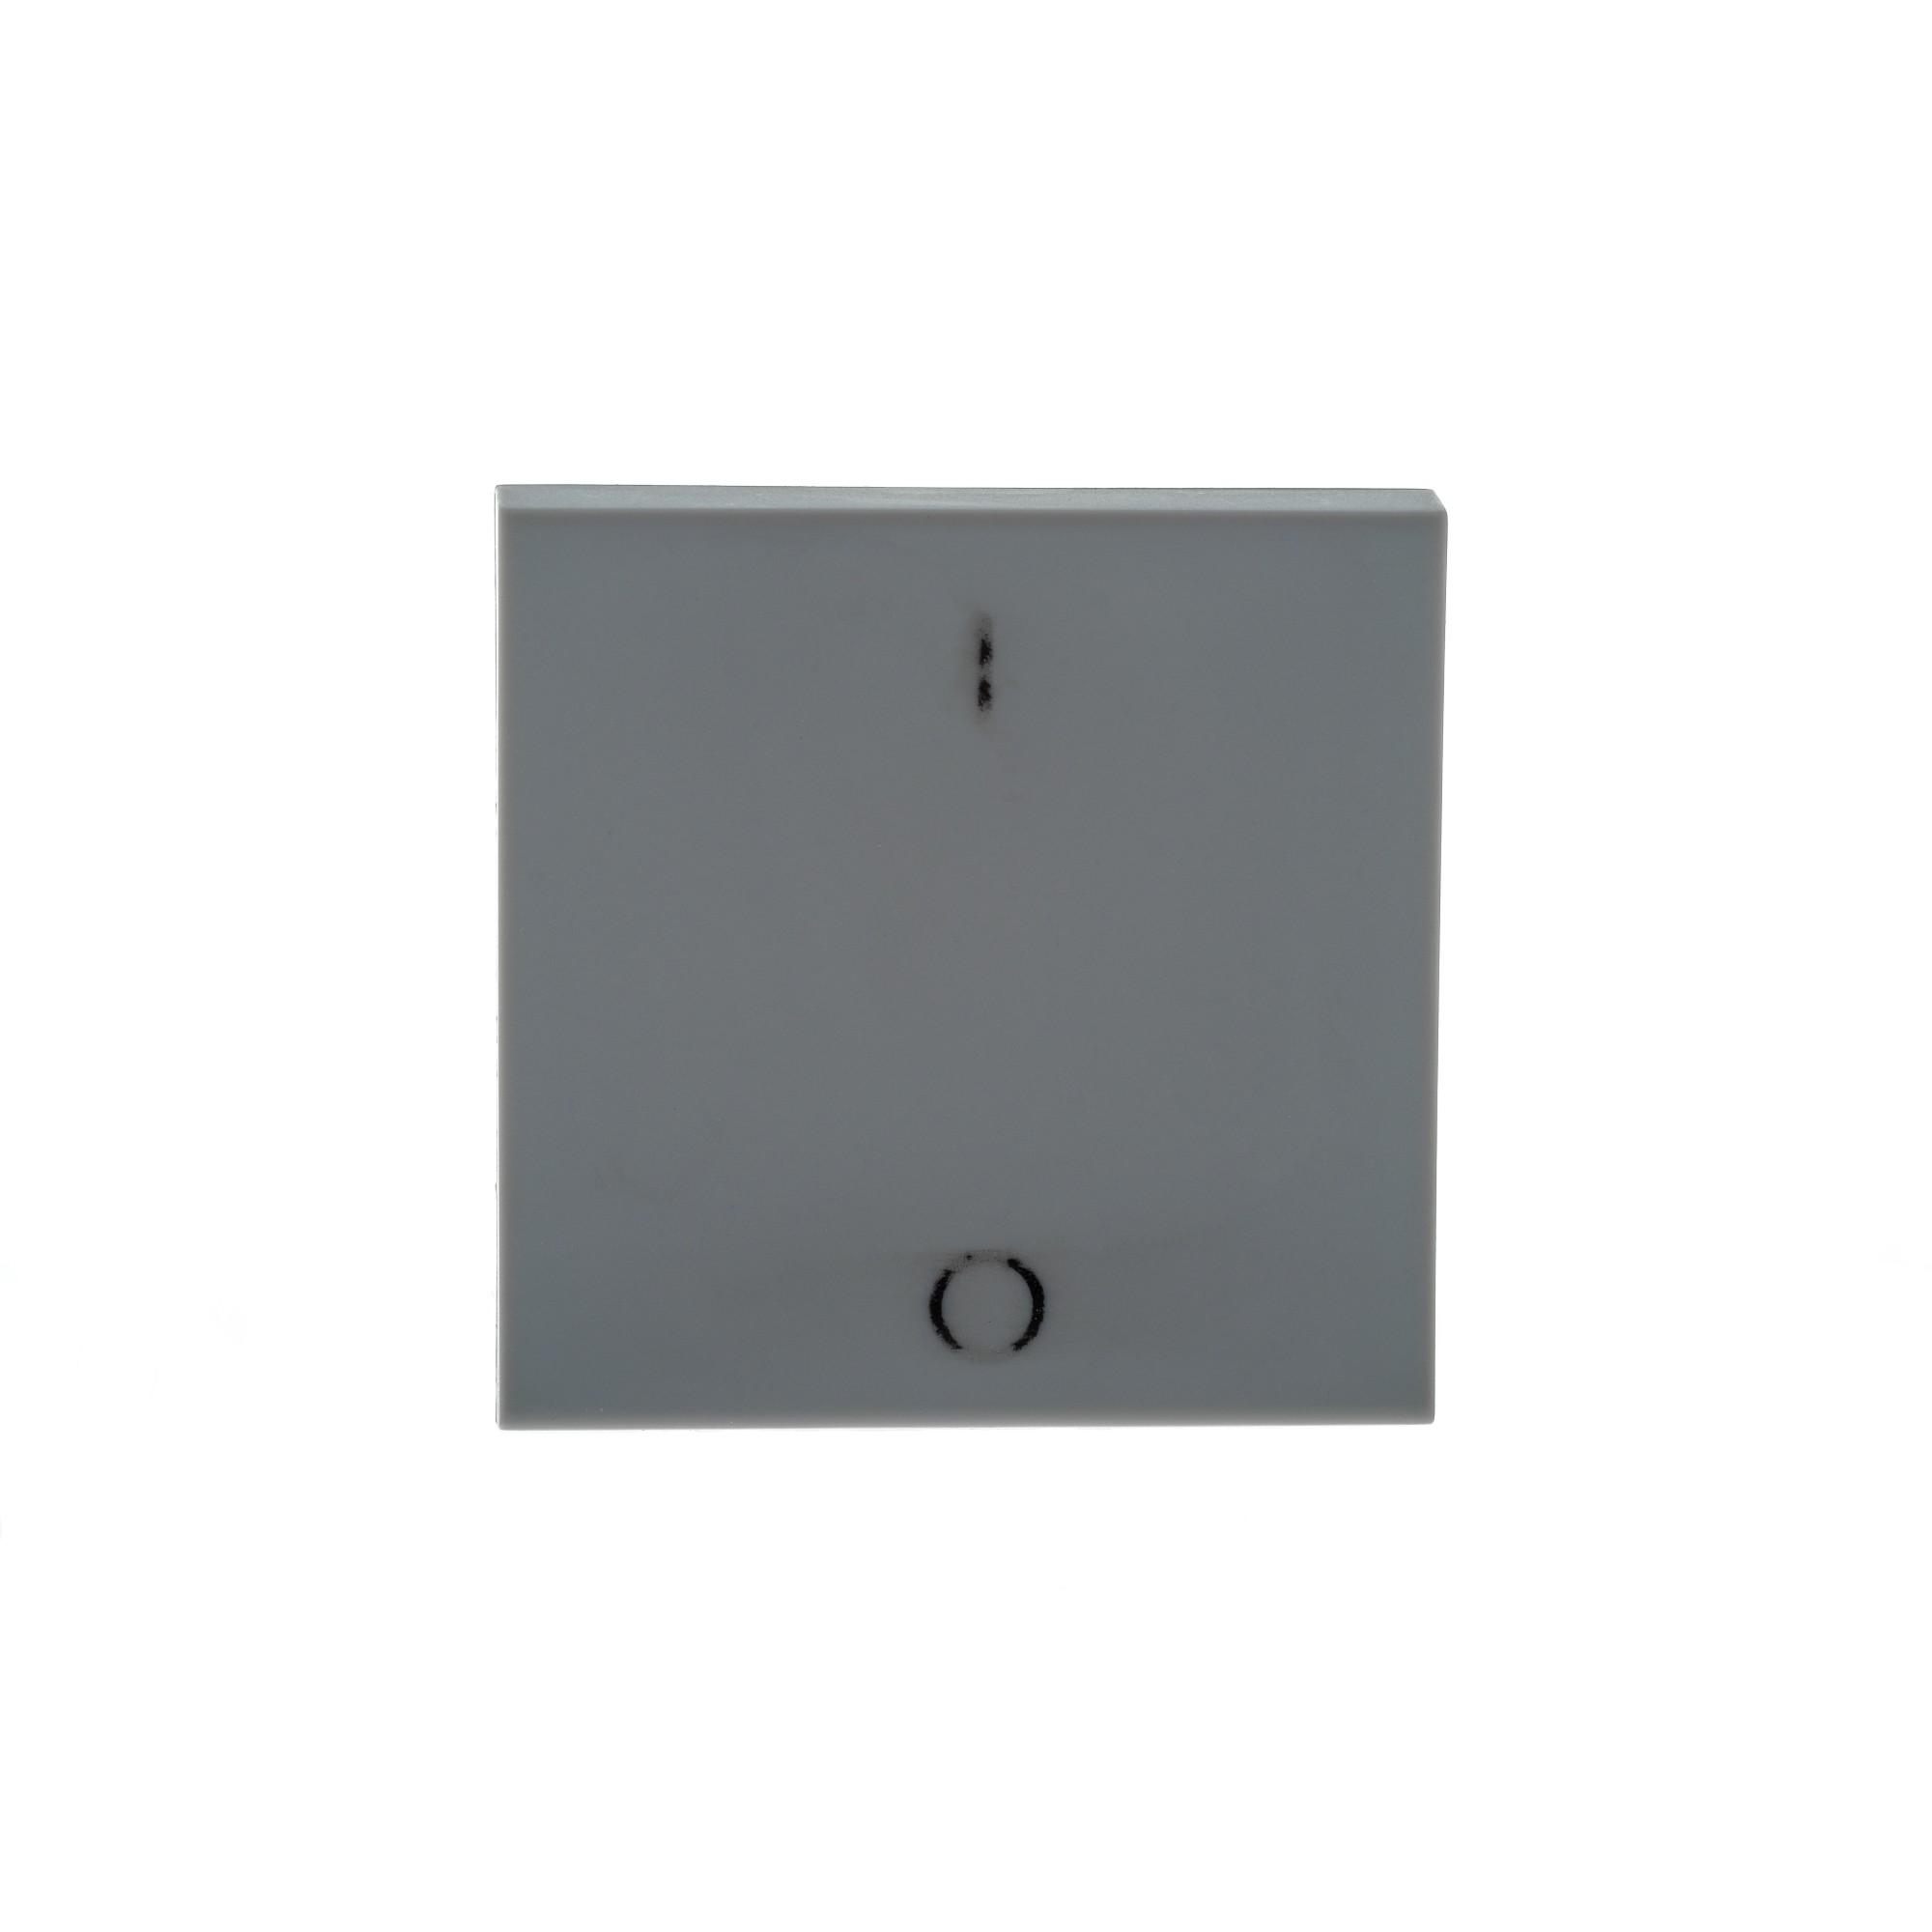 Modulo Interruptor Bipolar 1 Modulo 25A - Cinza - Plus - Legrand